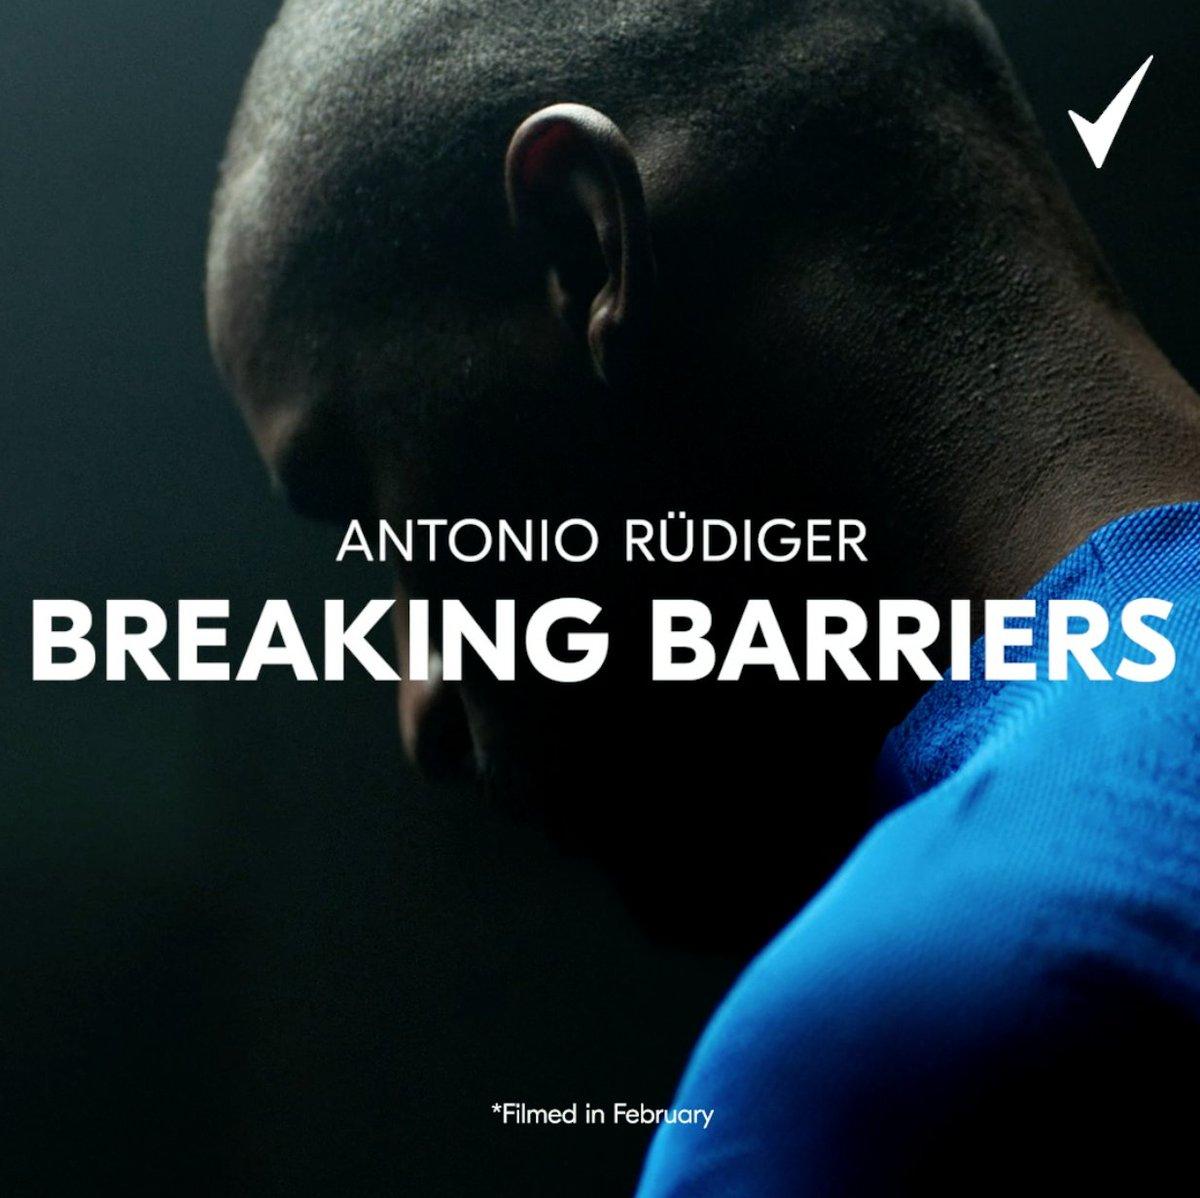 Overcoming adversity. Proving the doubters wrong. Realising childhood dreams. 👊 #BreakingBarriers, with @ToniRuediger #Rexona